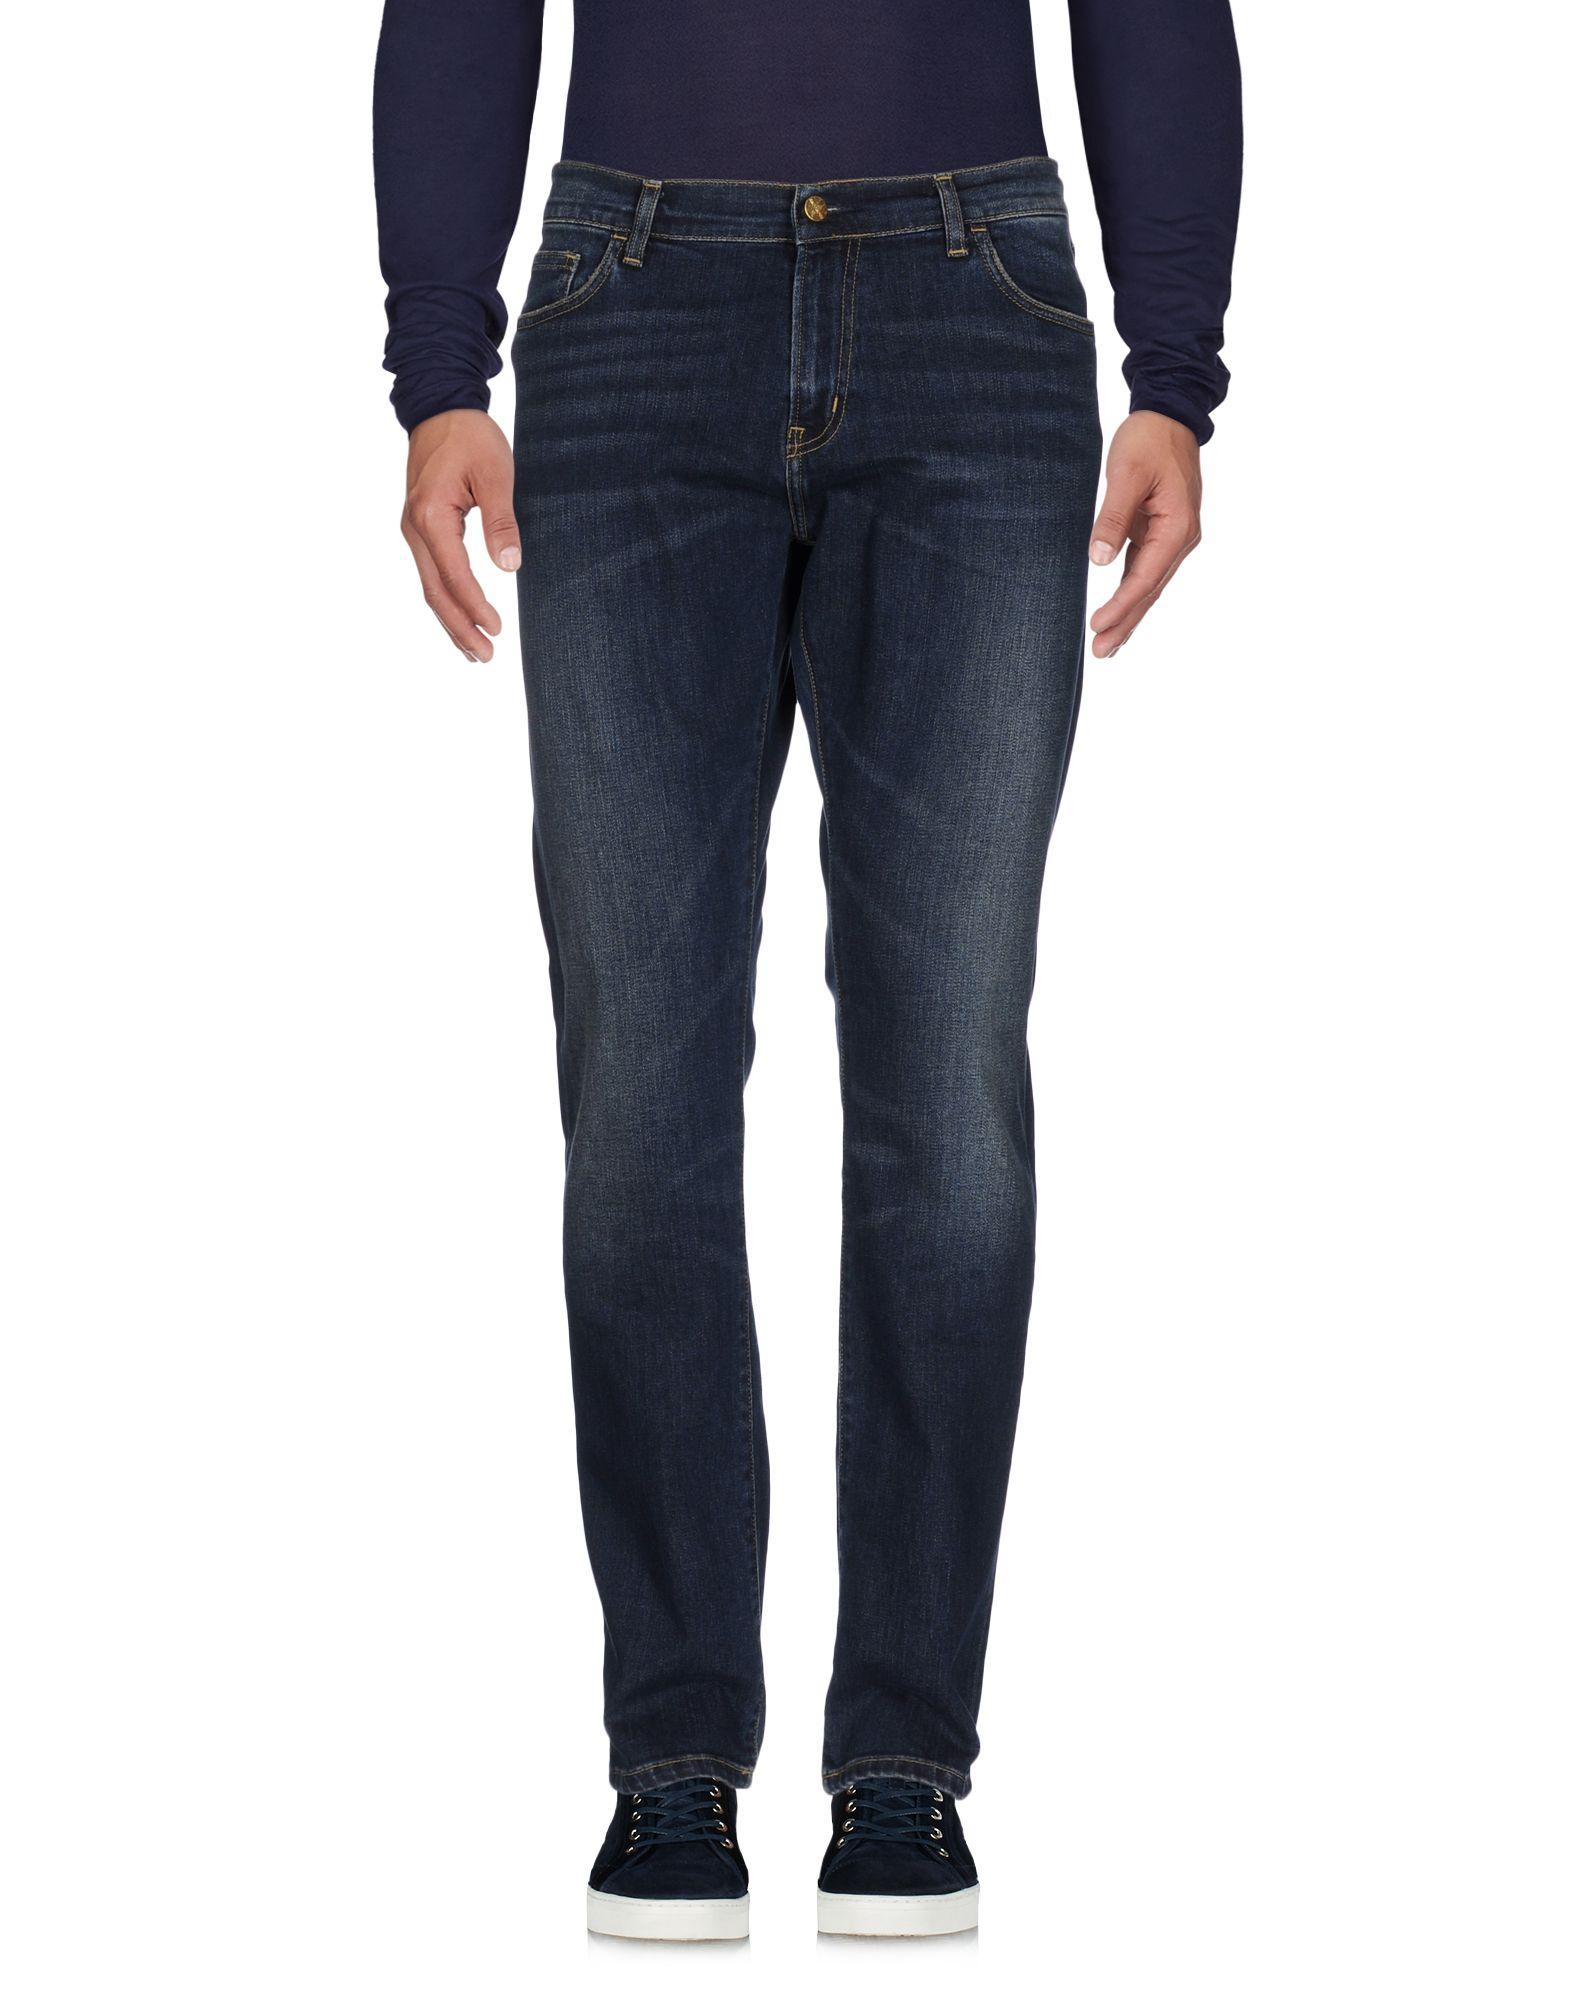 Pantaloni Jeans Carhartt Donna - Acquista online su